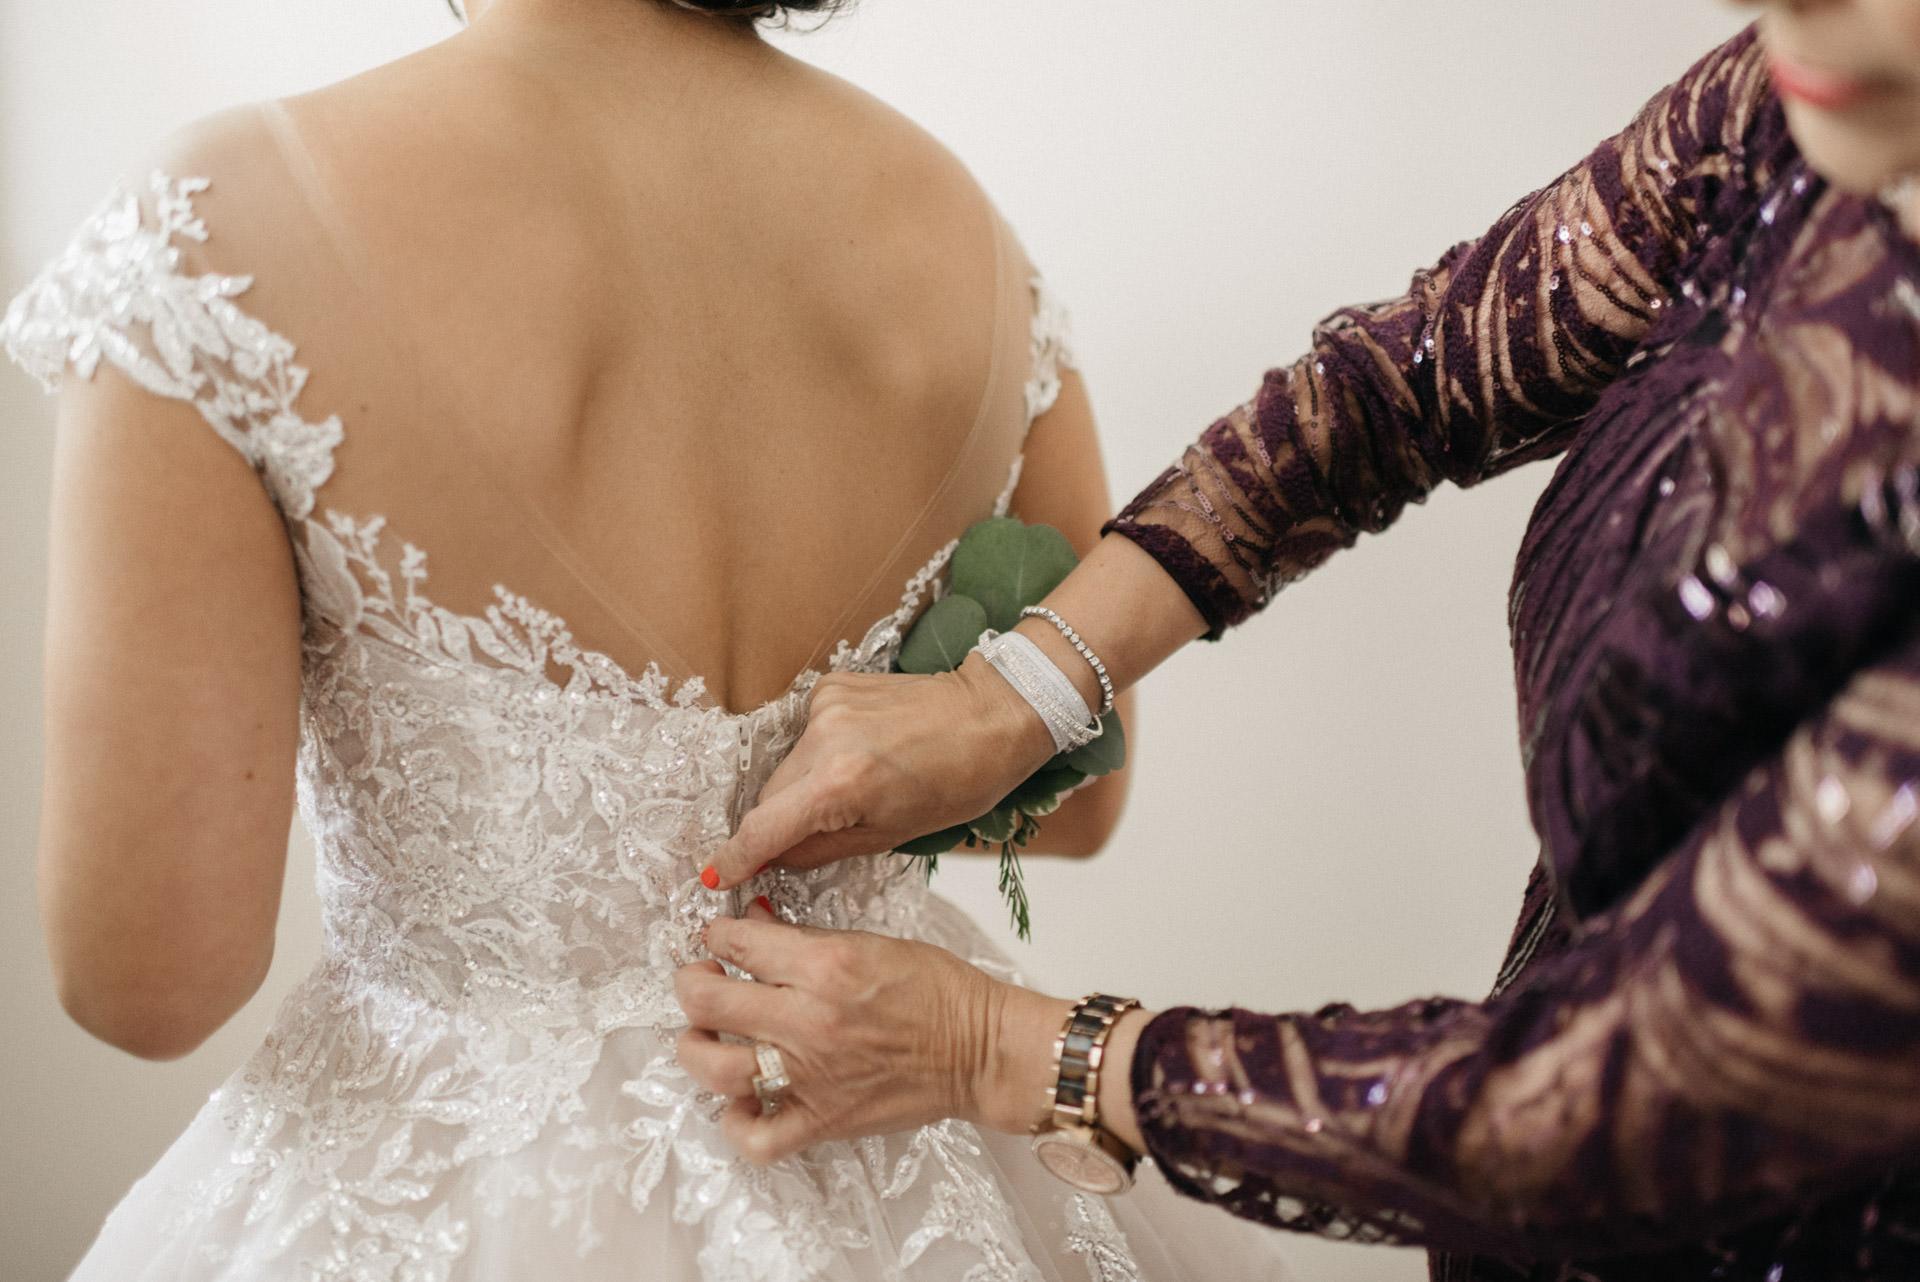 lexi-michael-wedding-blog-sm-22.jpg